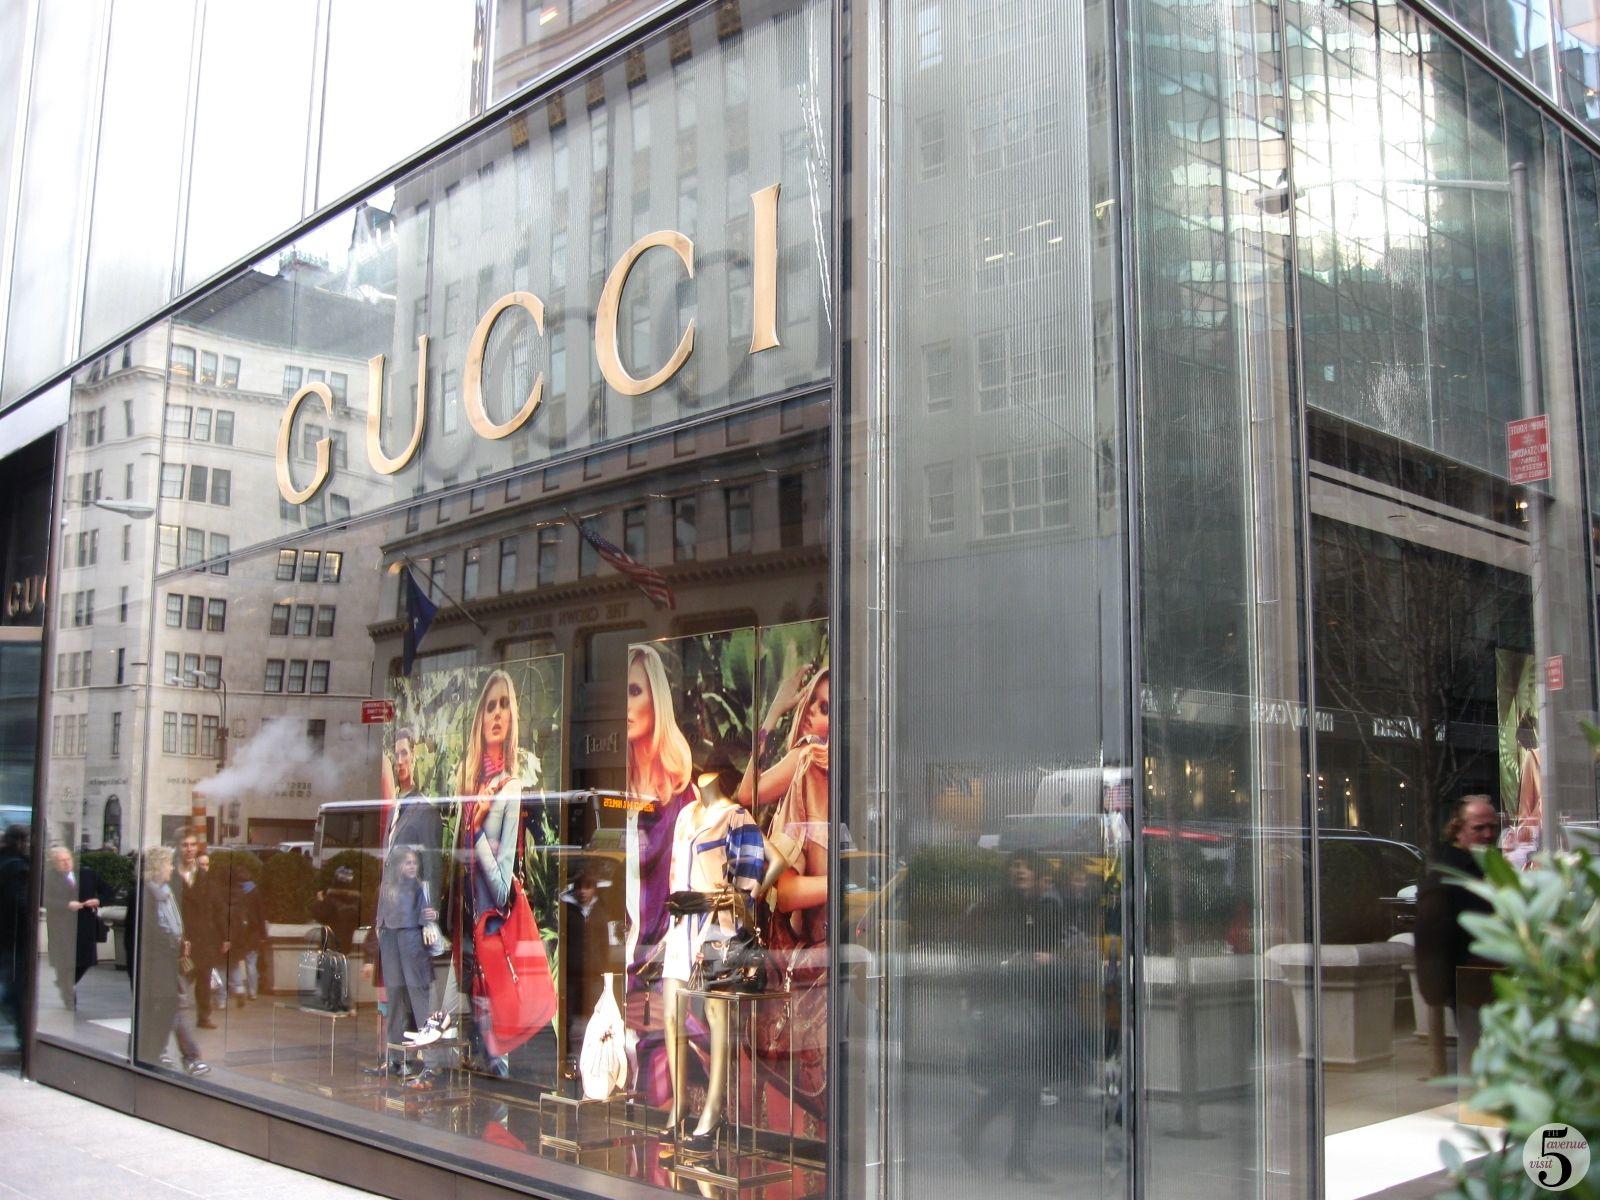 Pin By Transcendersair On Newyork Flash Gucci Store Nyc Nyc Shopping New York Shopping